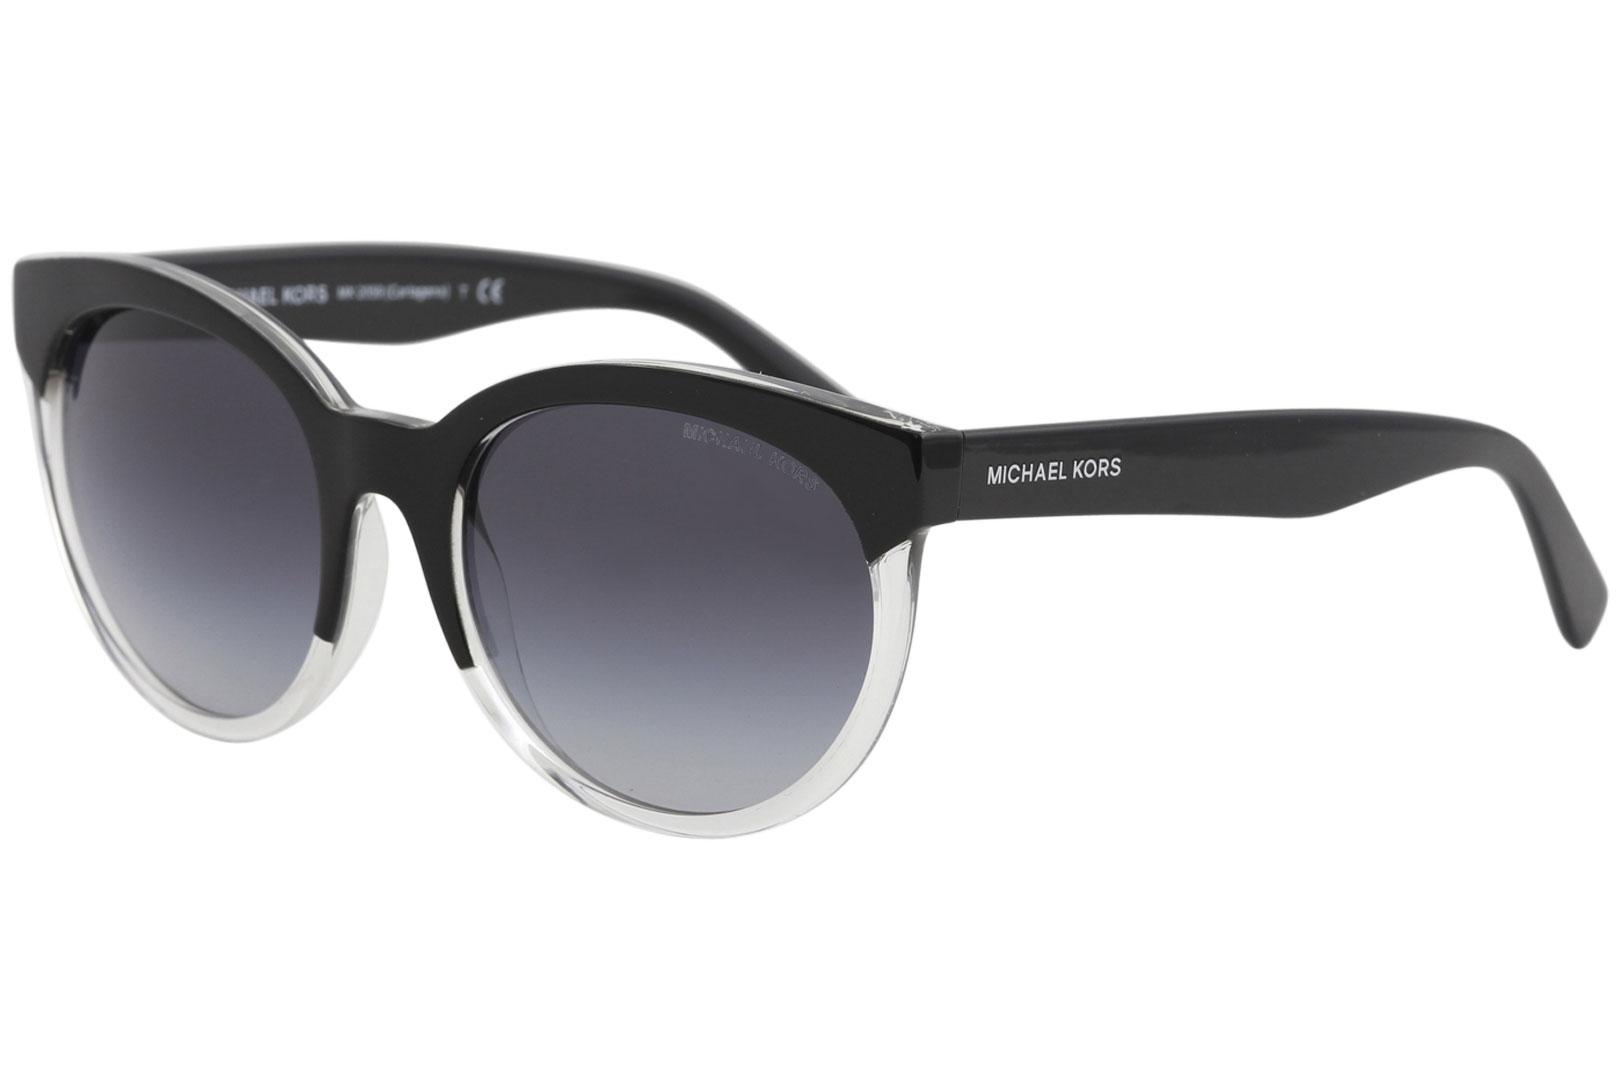 ee0a90a77f Michael Kors Women s Cartagena MK2059 MK 2059 Fashion Round Sunglasses by Michael  Kors